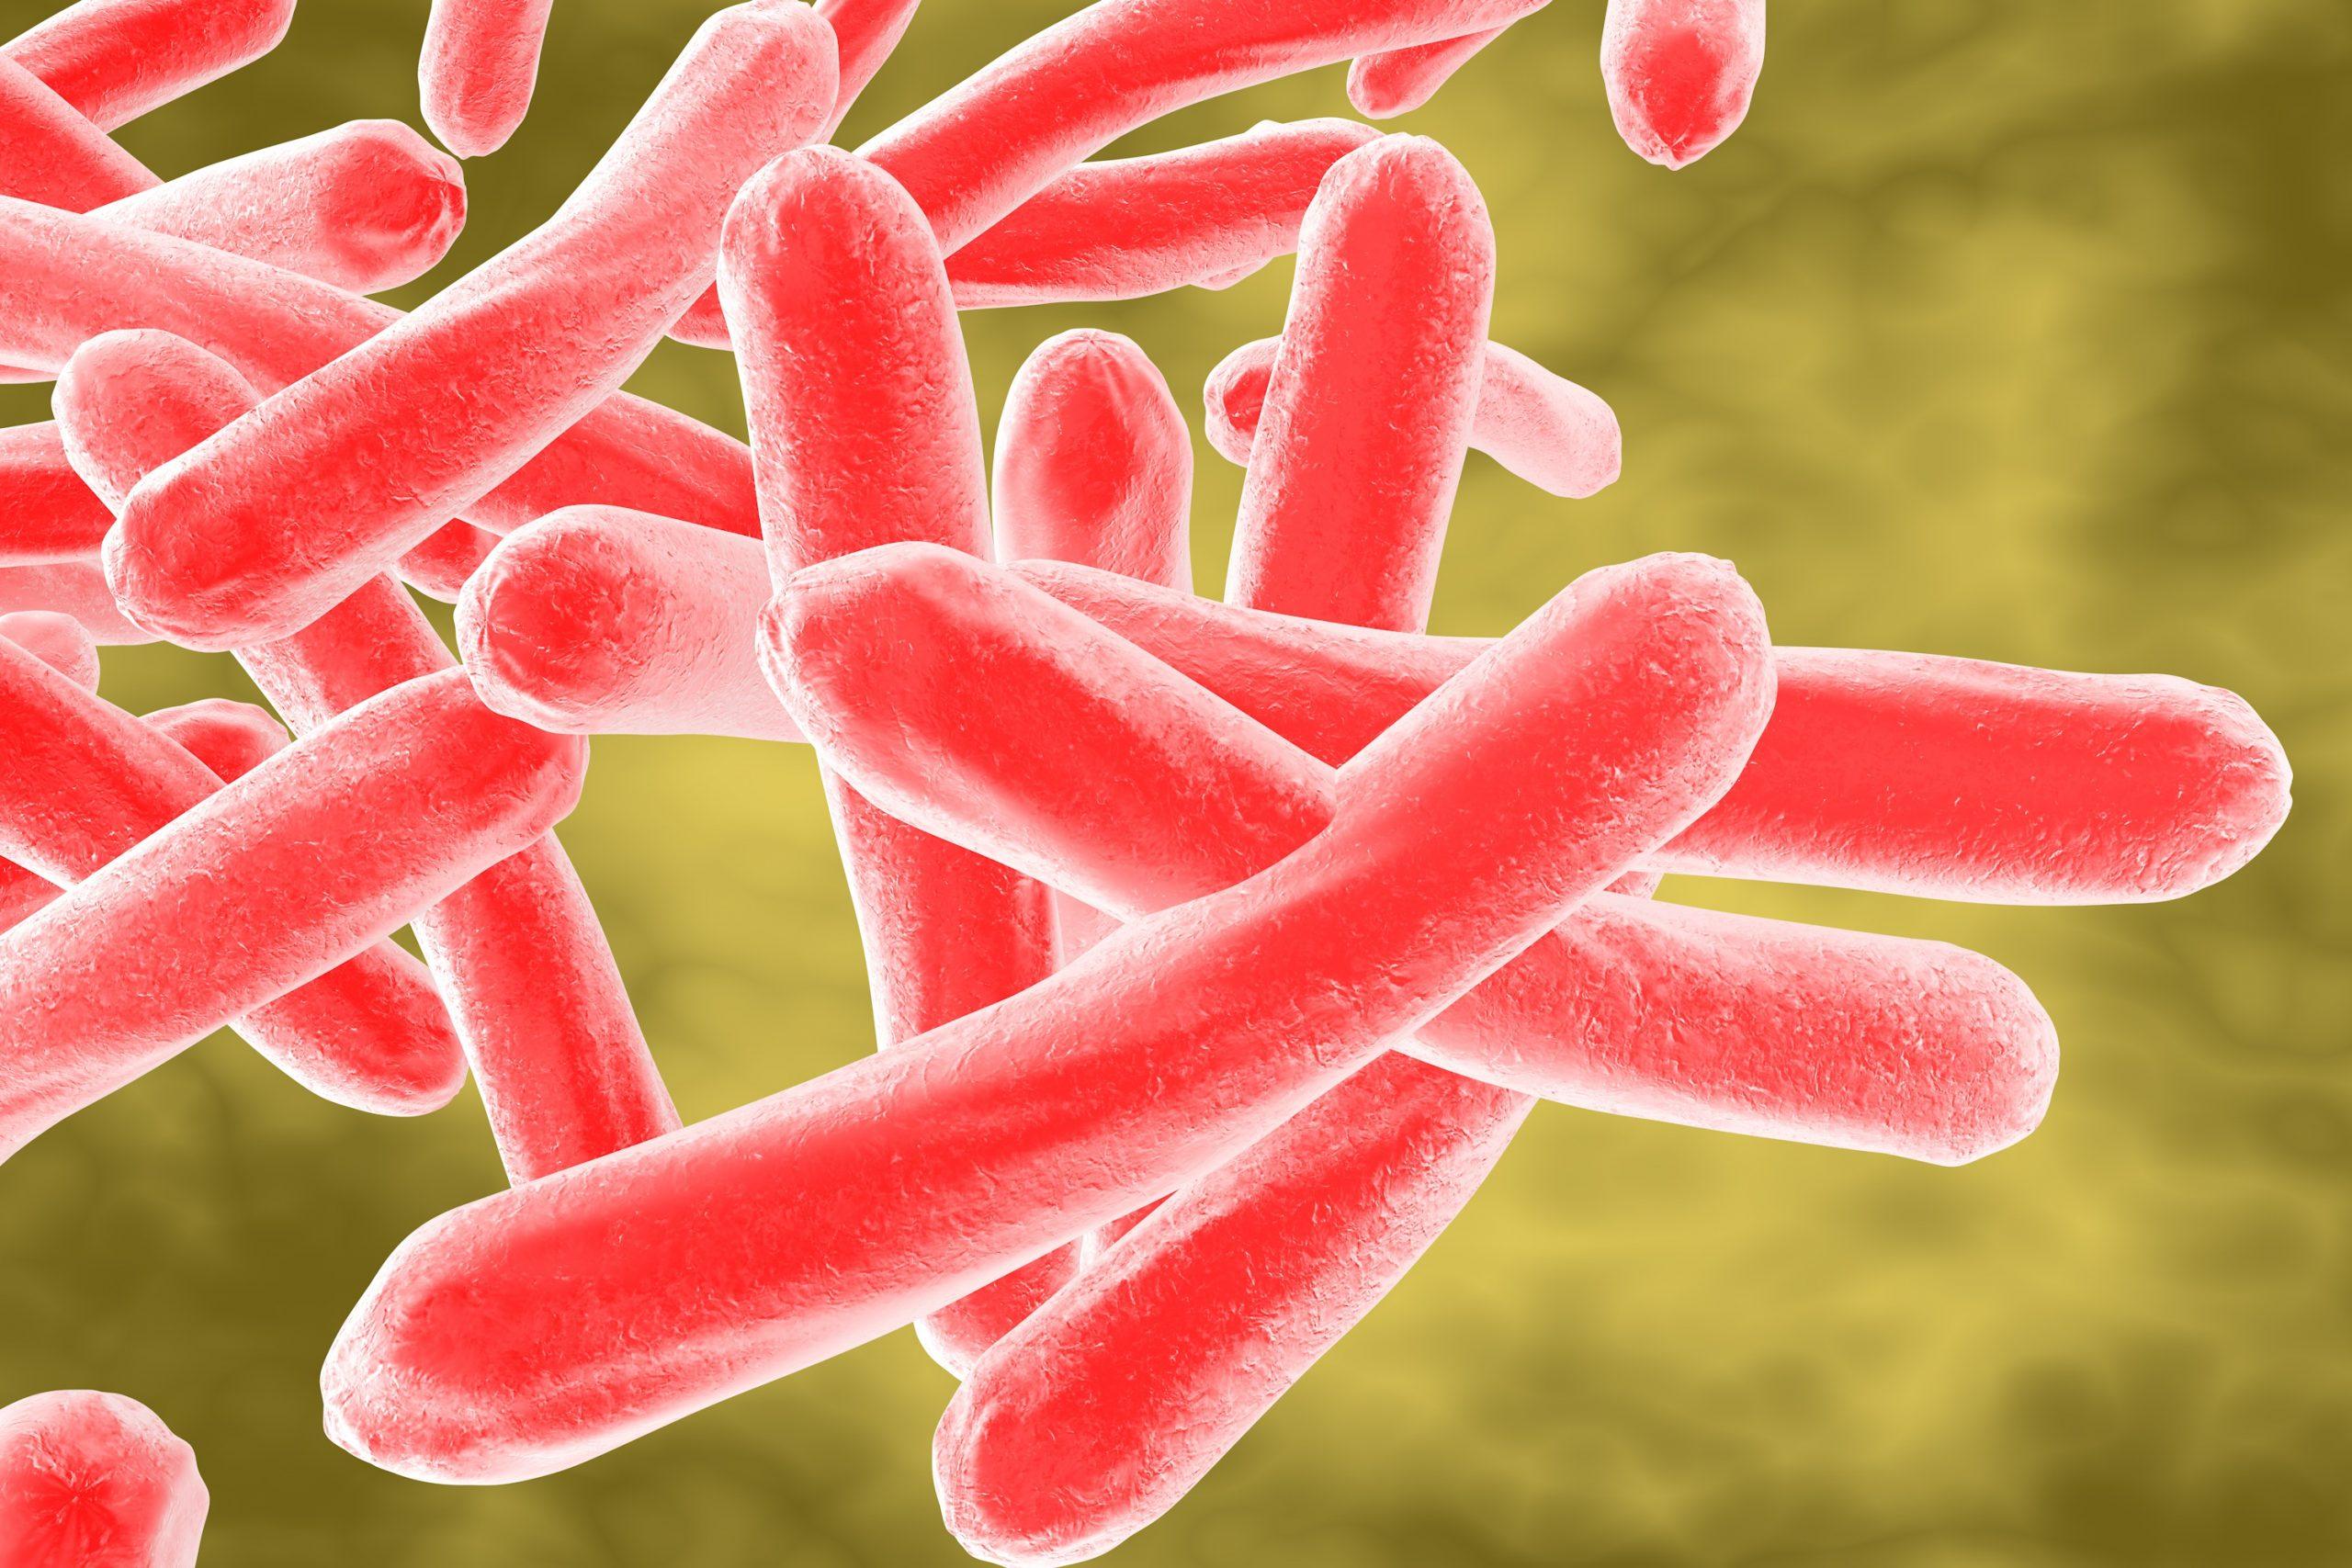 tuberculosis - https://depositphotos.com/78119374/stock-photo-mycobacterium-tuberculosis.html